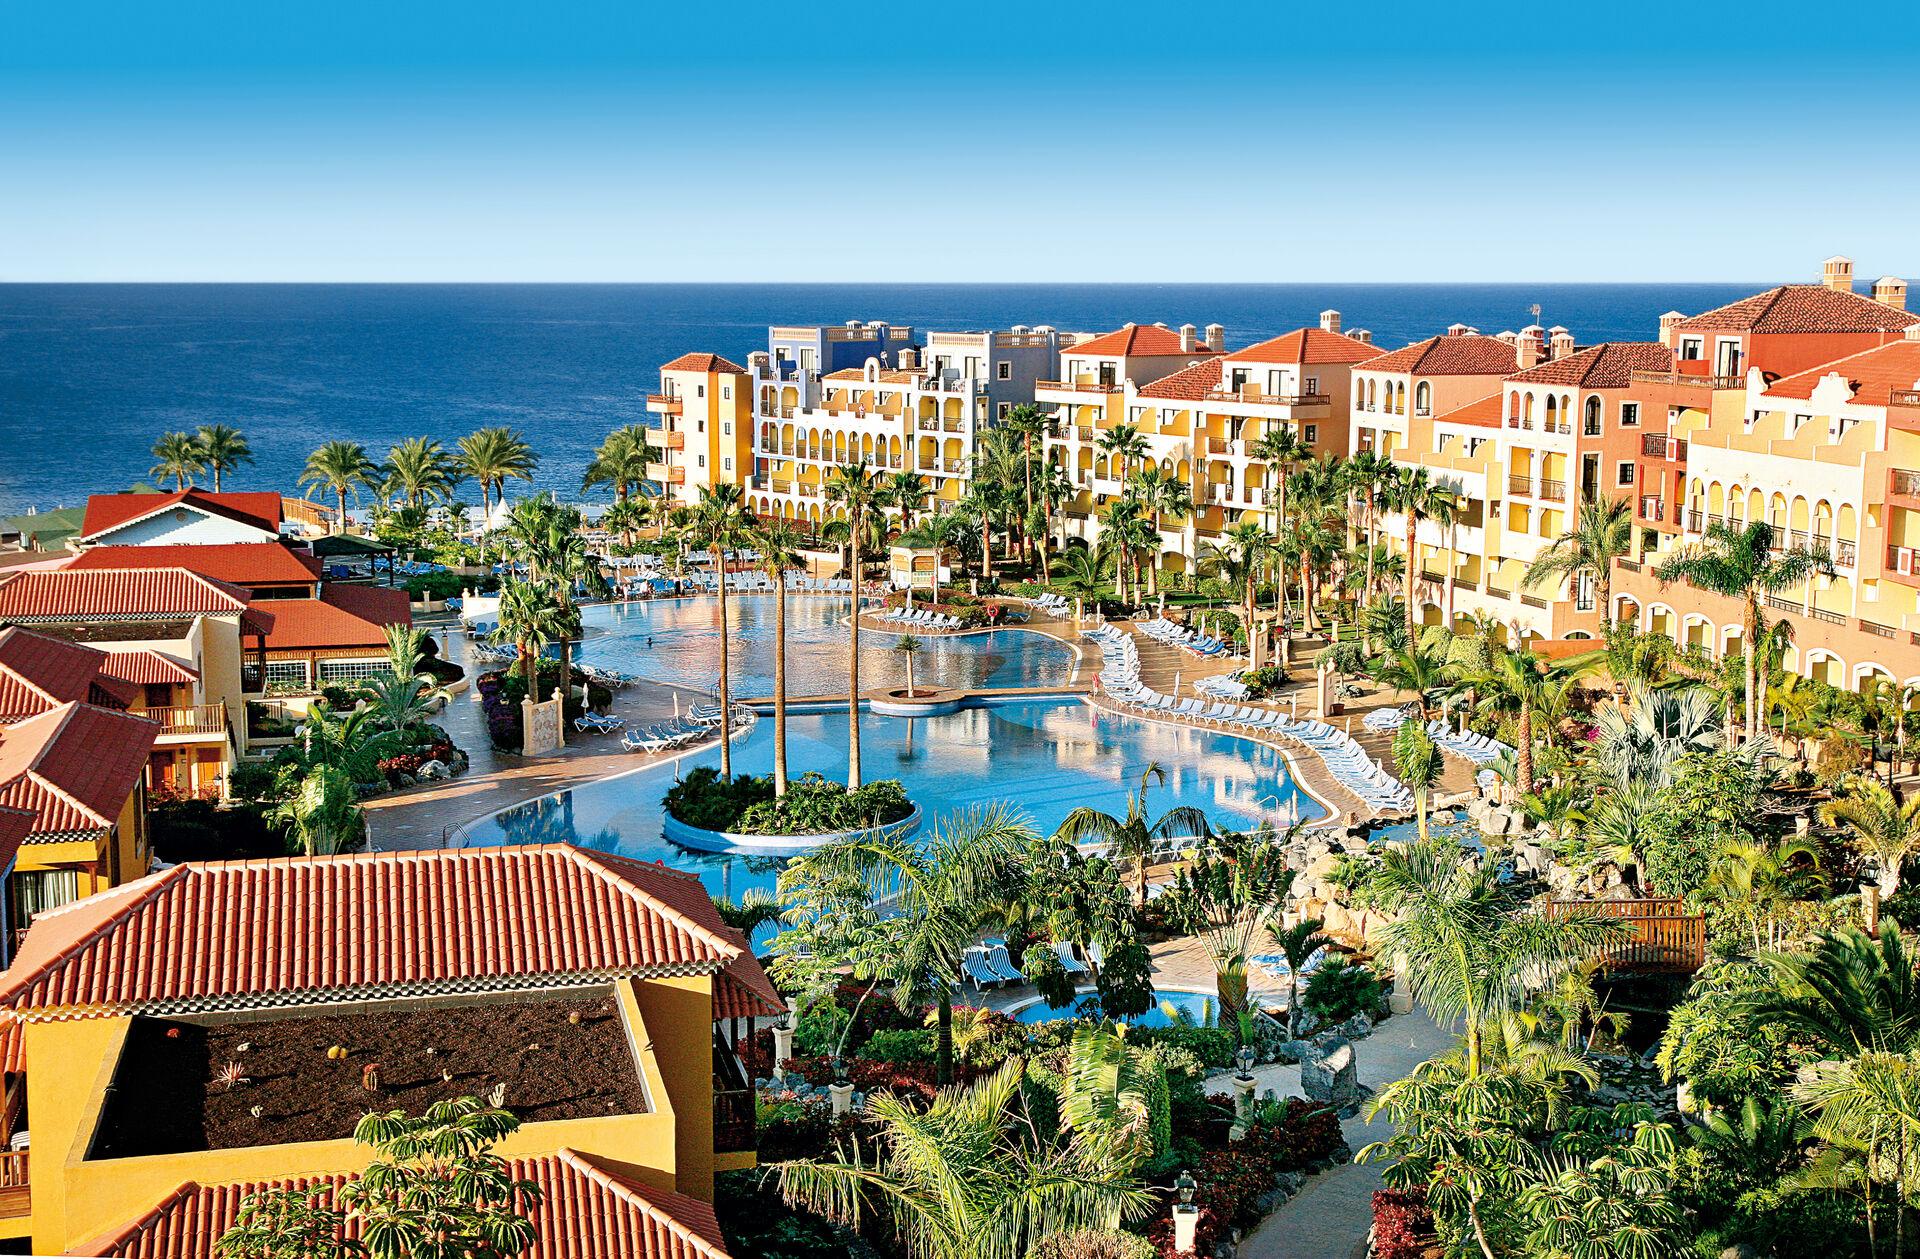 Séjour Espagne - Bahia Principe Sunlight Tenerife Resort - 4*